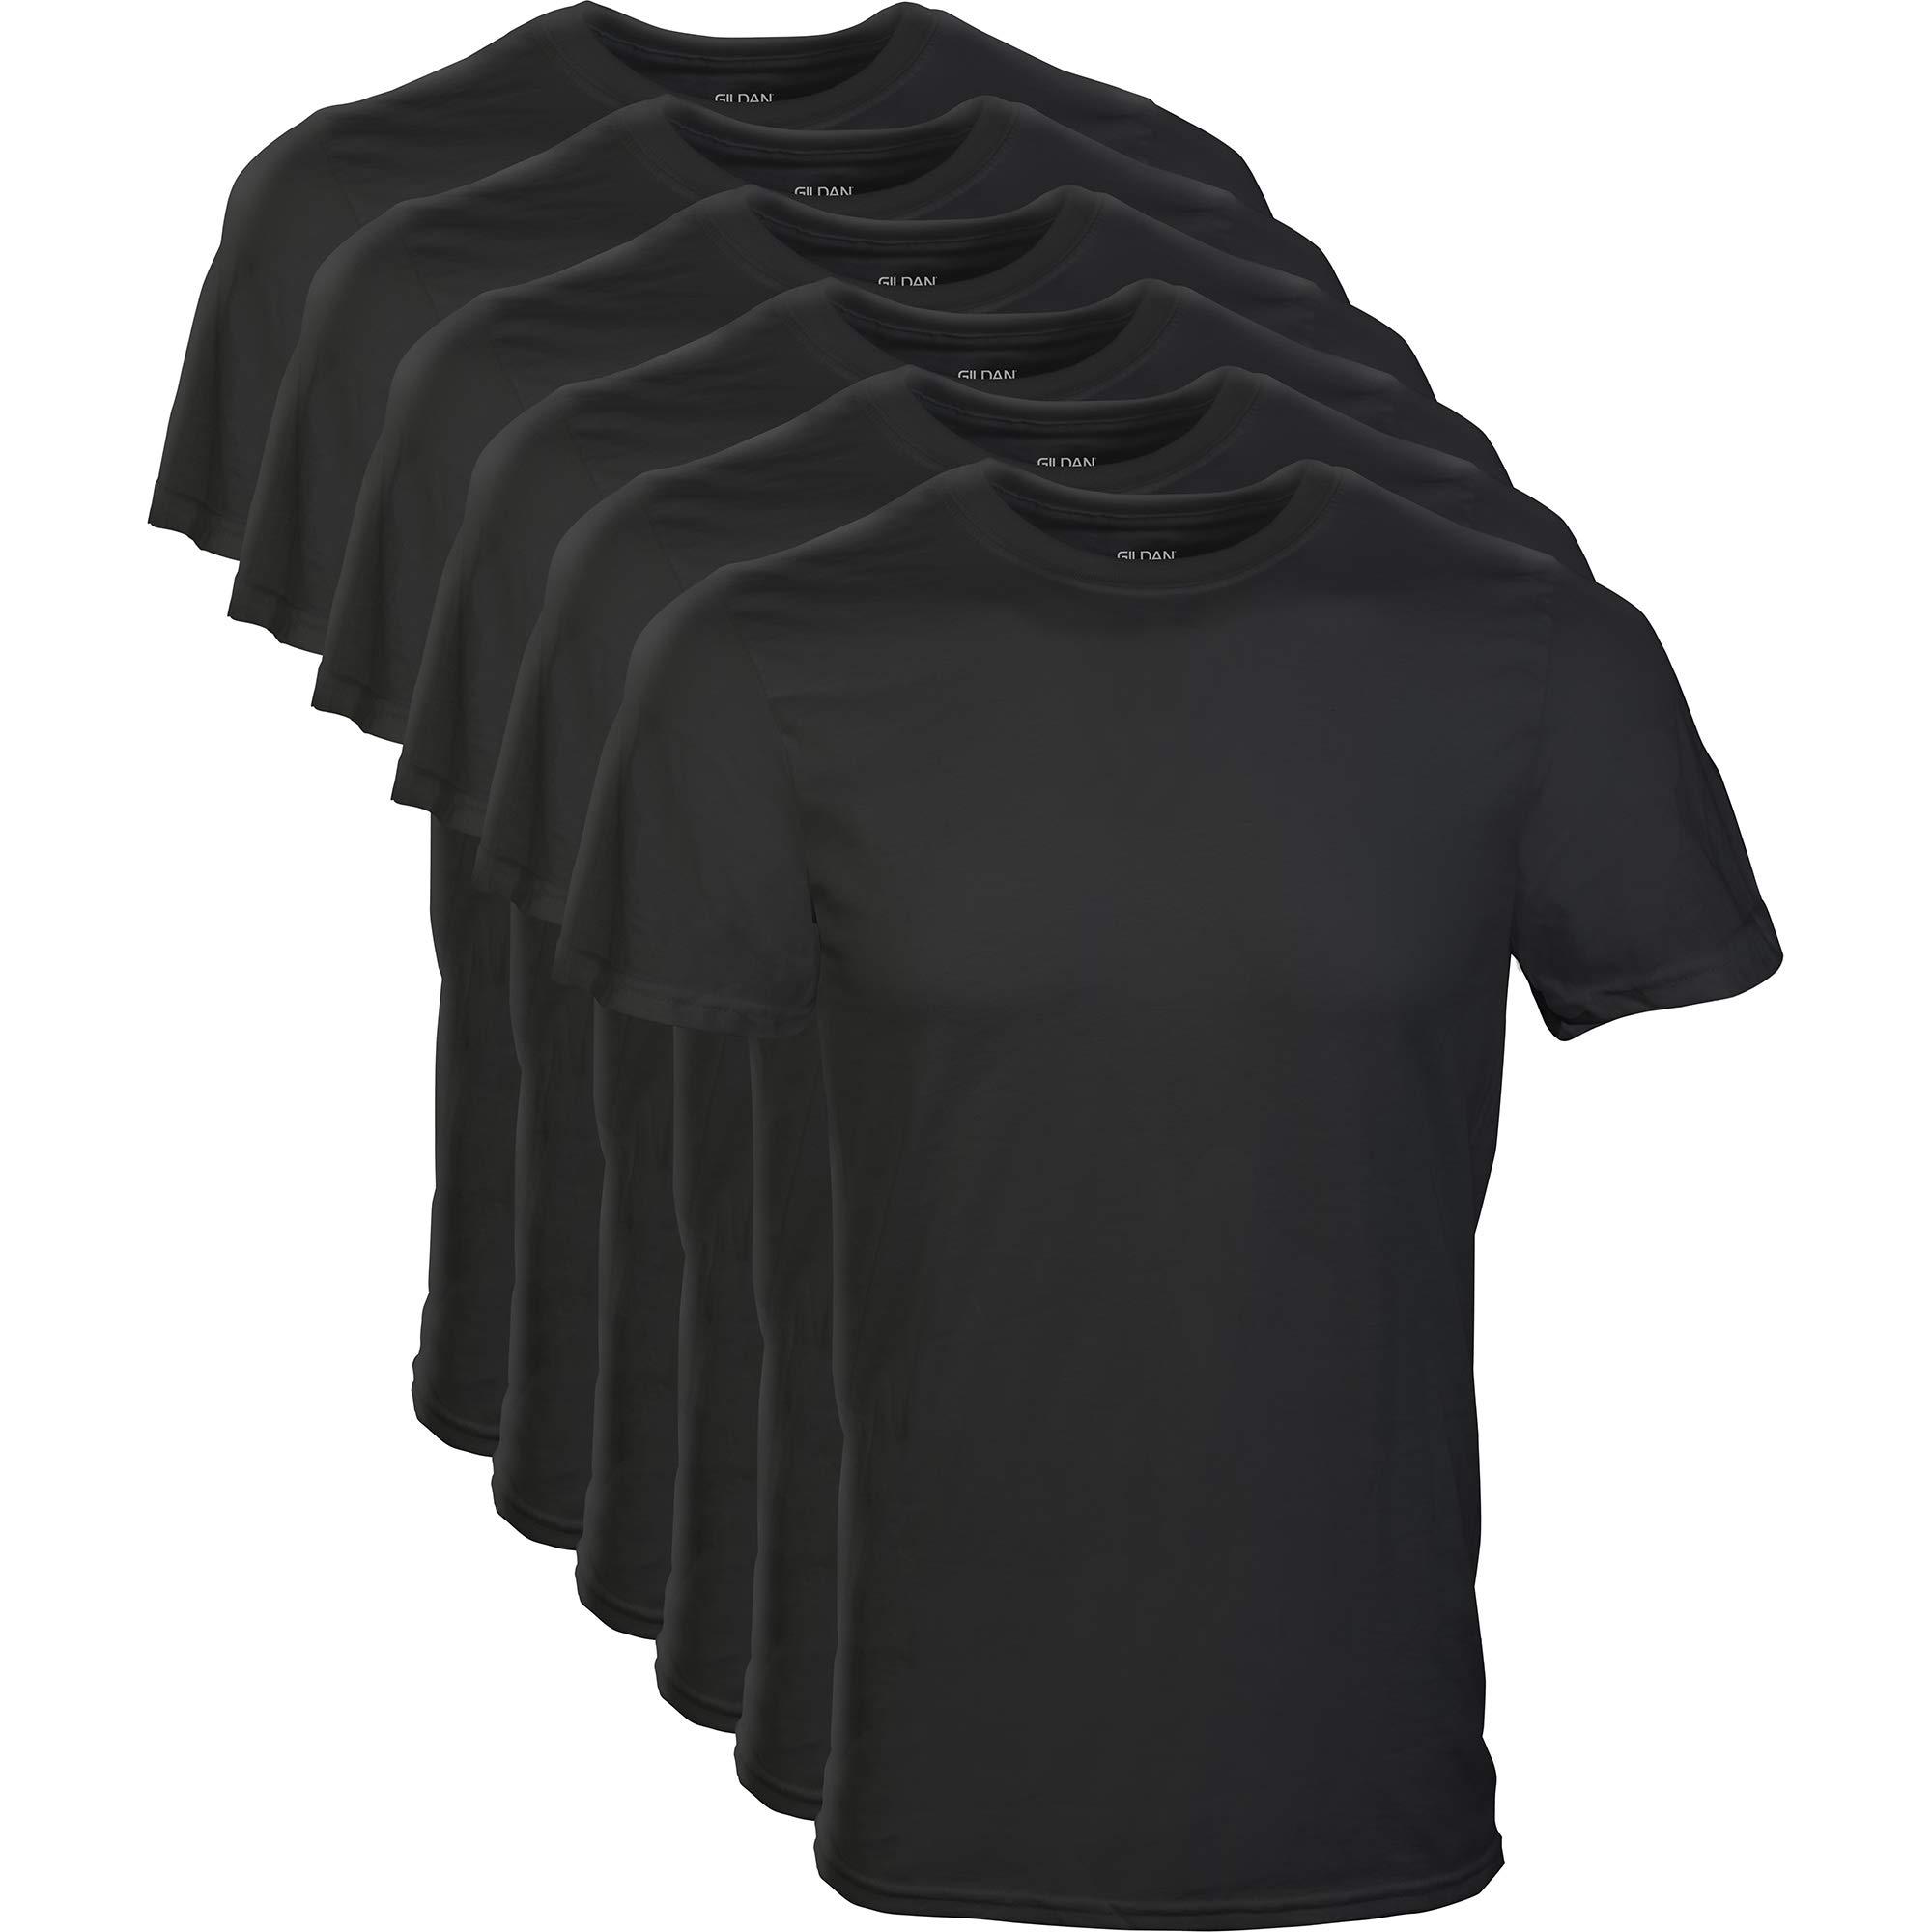 Gildan Men's Crew T-Shirt Multipack, Black, Large by Gildan